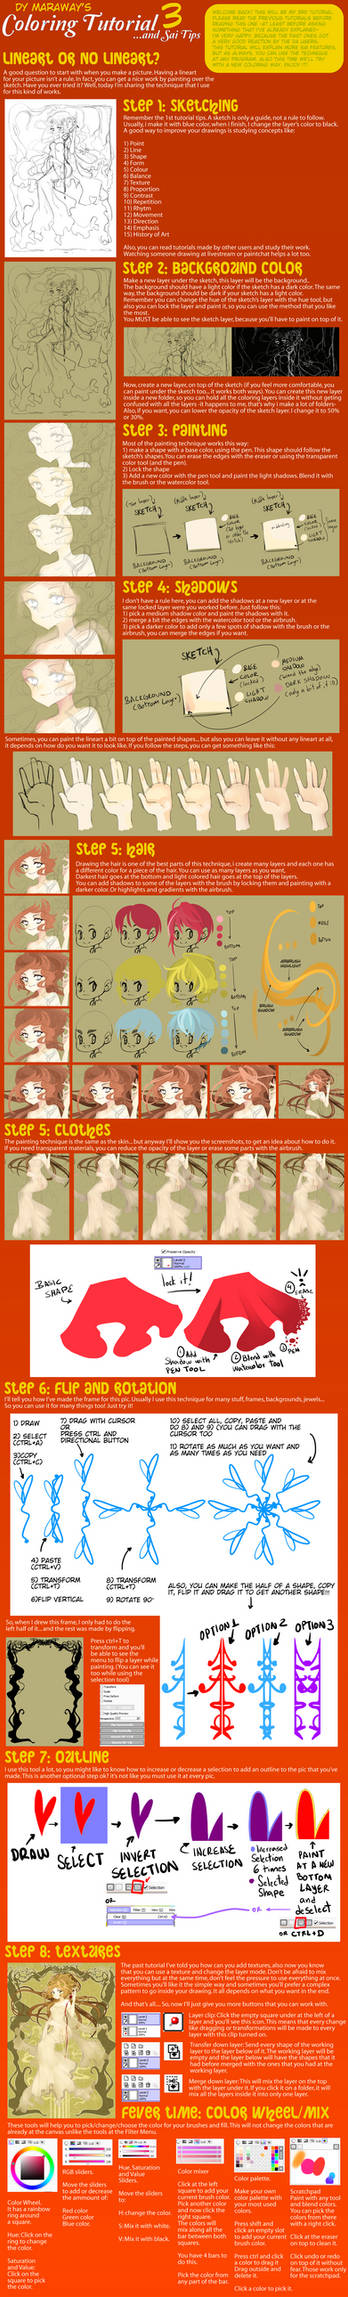 Coloring Tutorial and Sai Tips 3